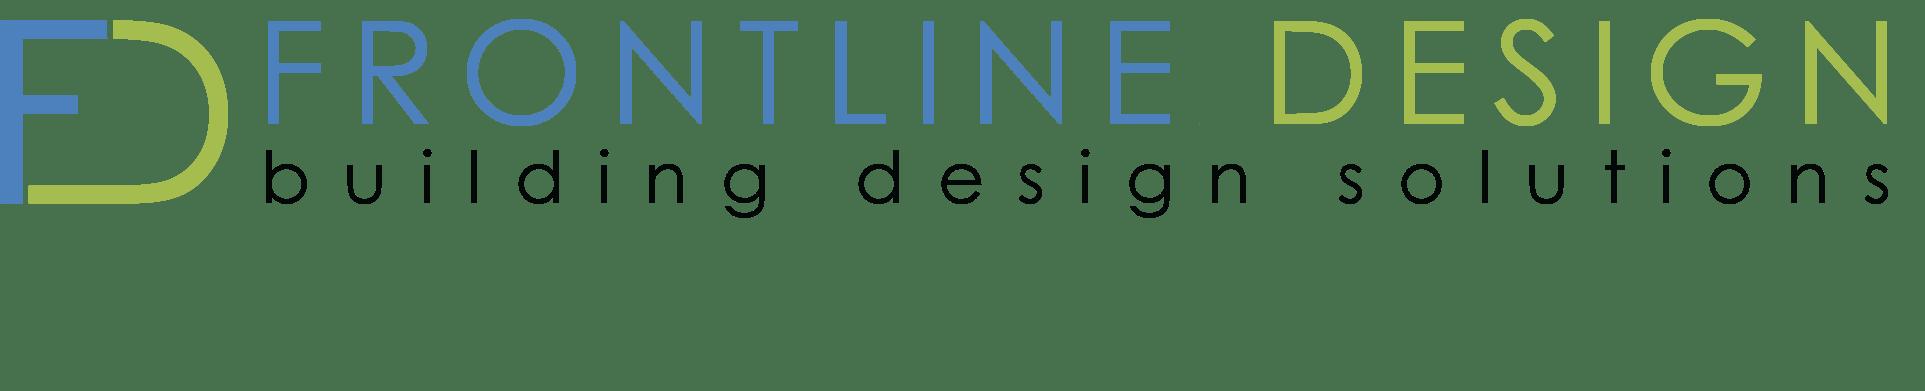 Frontline Design Building Design Solutions